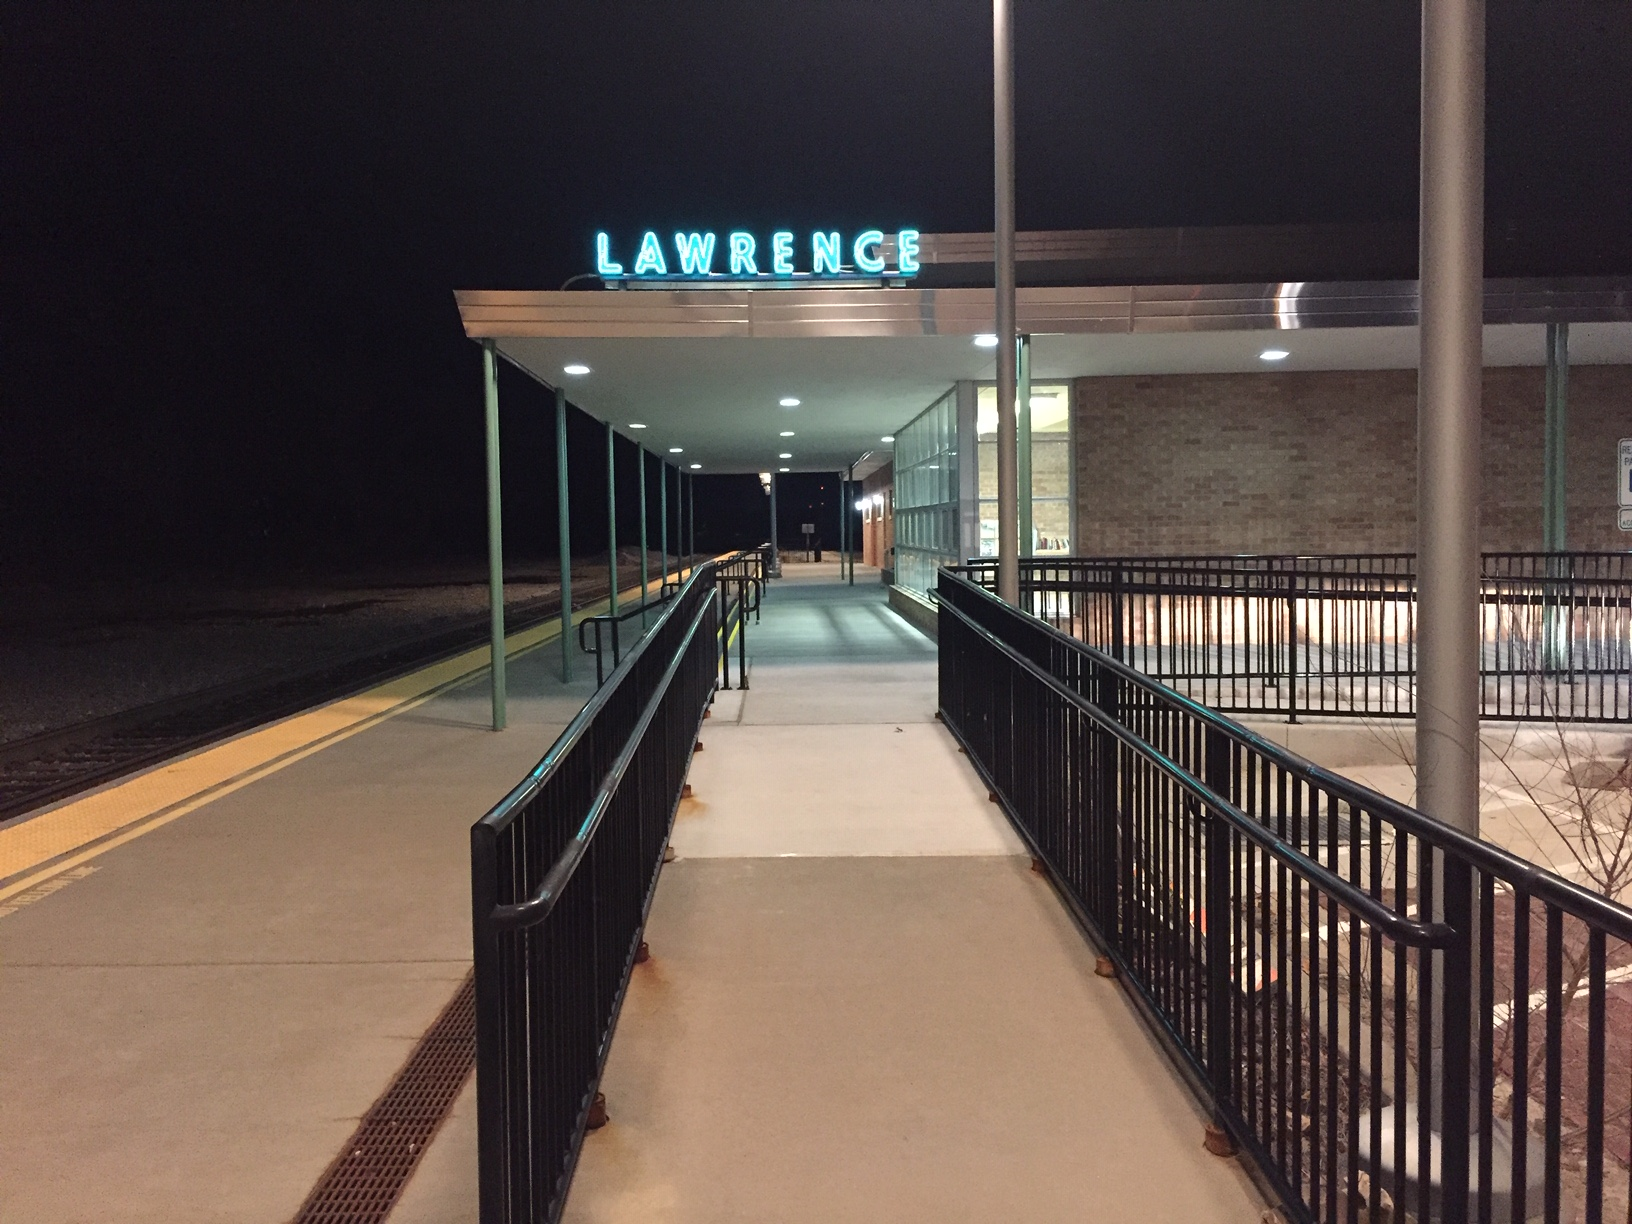 Lawrence train depot (Photo by J. Schafer)